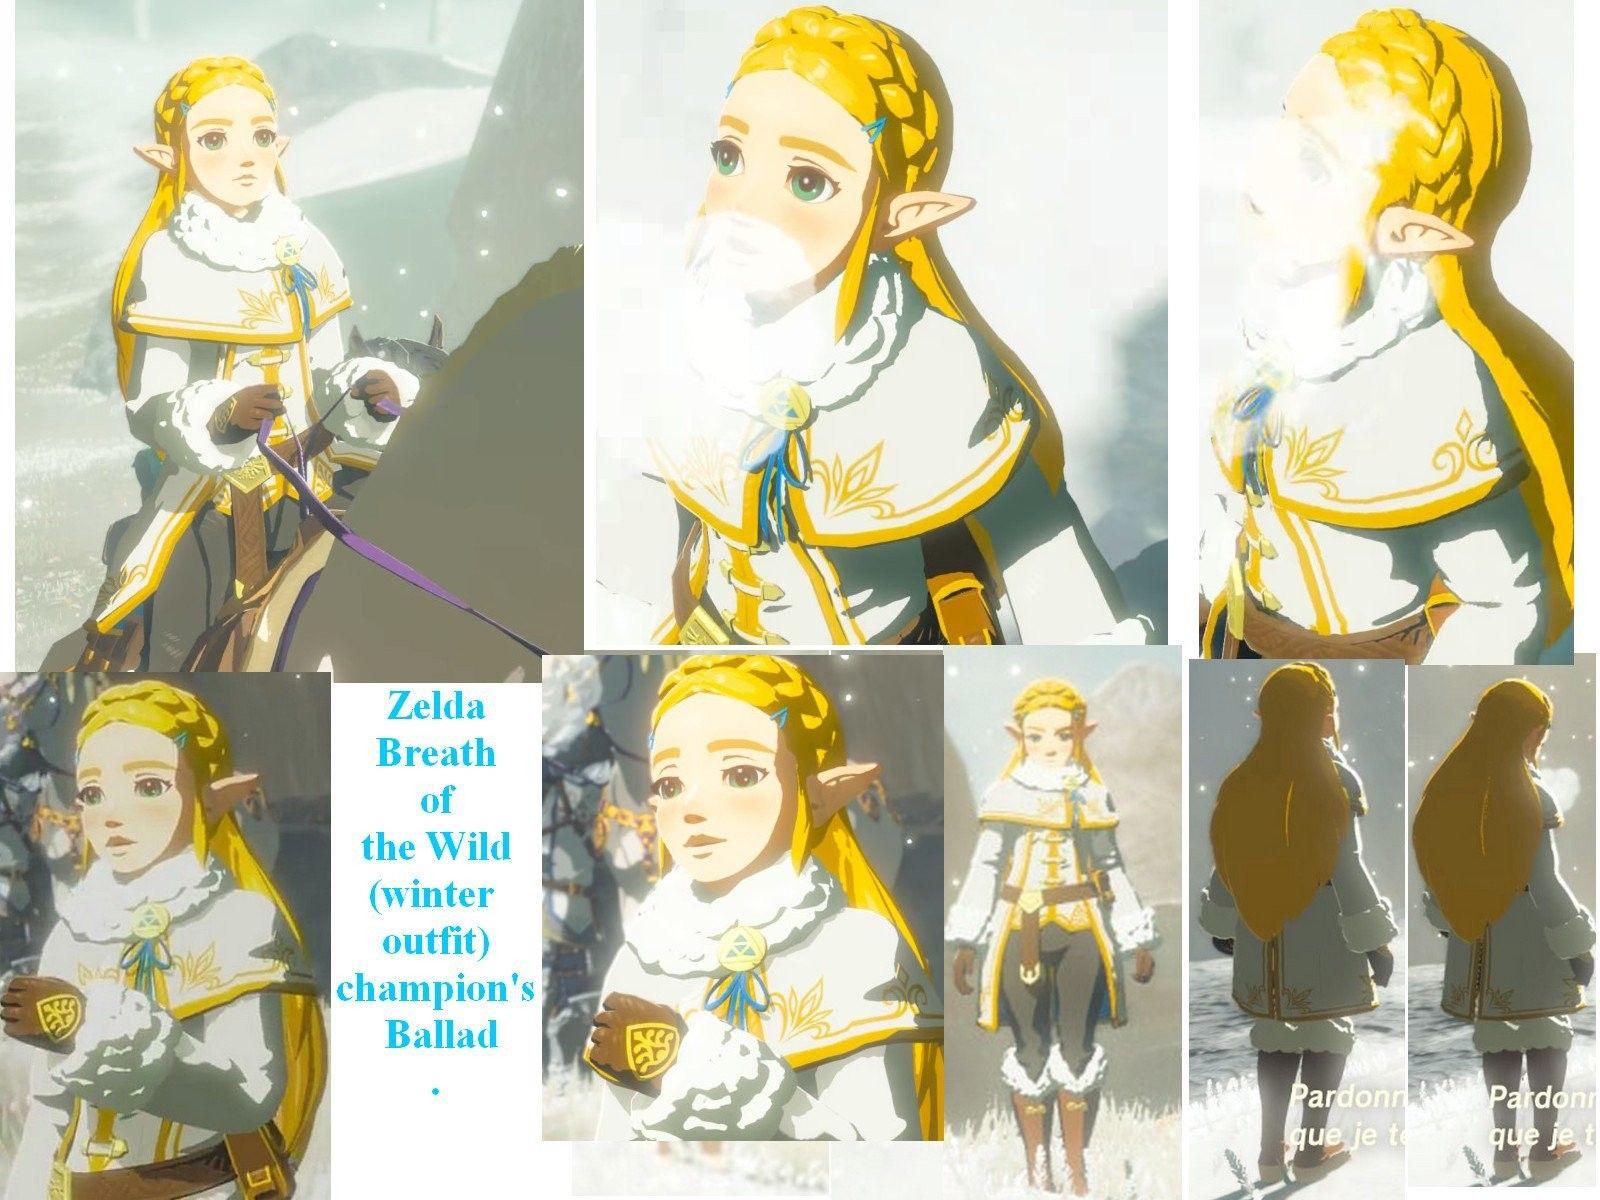 Zelda Botw Winter Outfit Dlc Wild Outfits Princess Zelda Breath Of The Wild